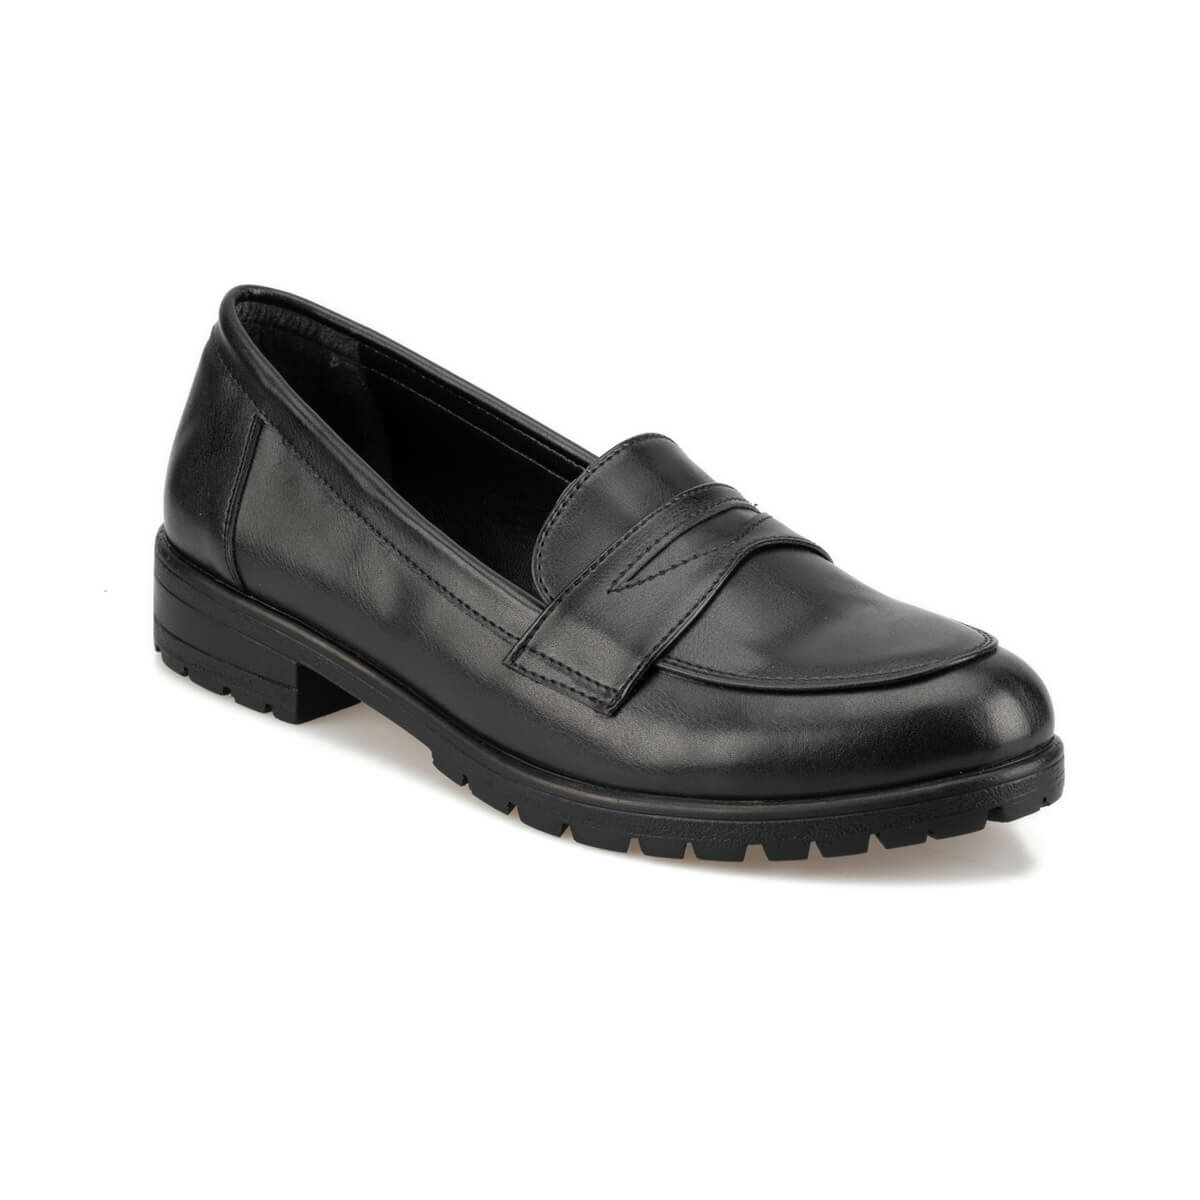 FLO 92.309131CZ Black Women Loafer Shoes Polaris